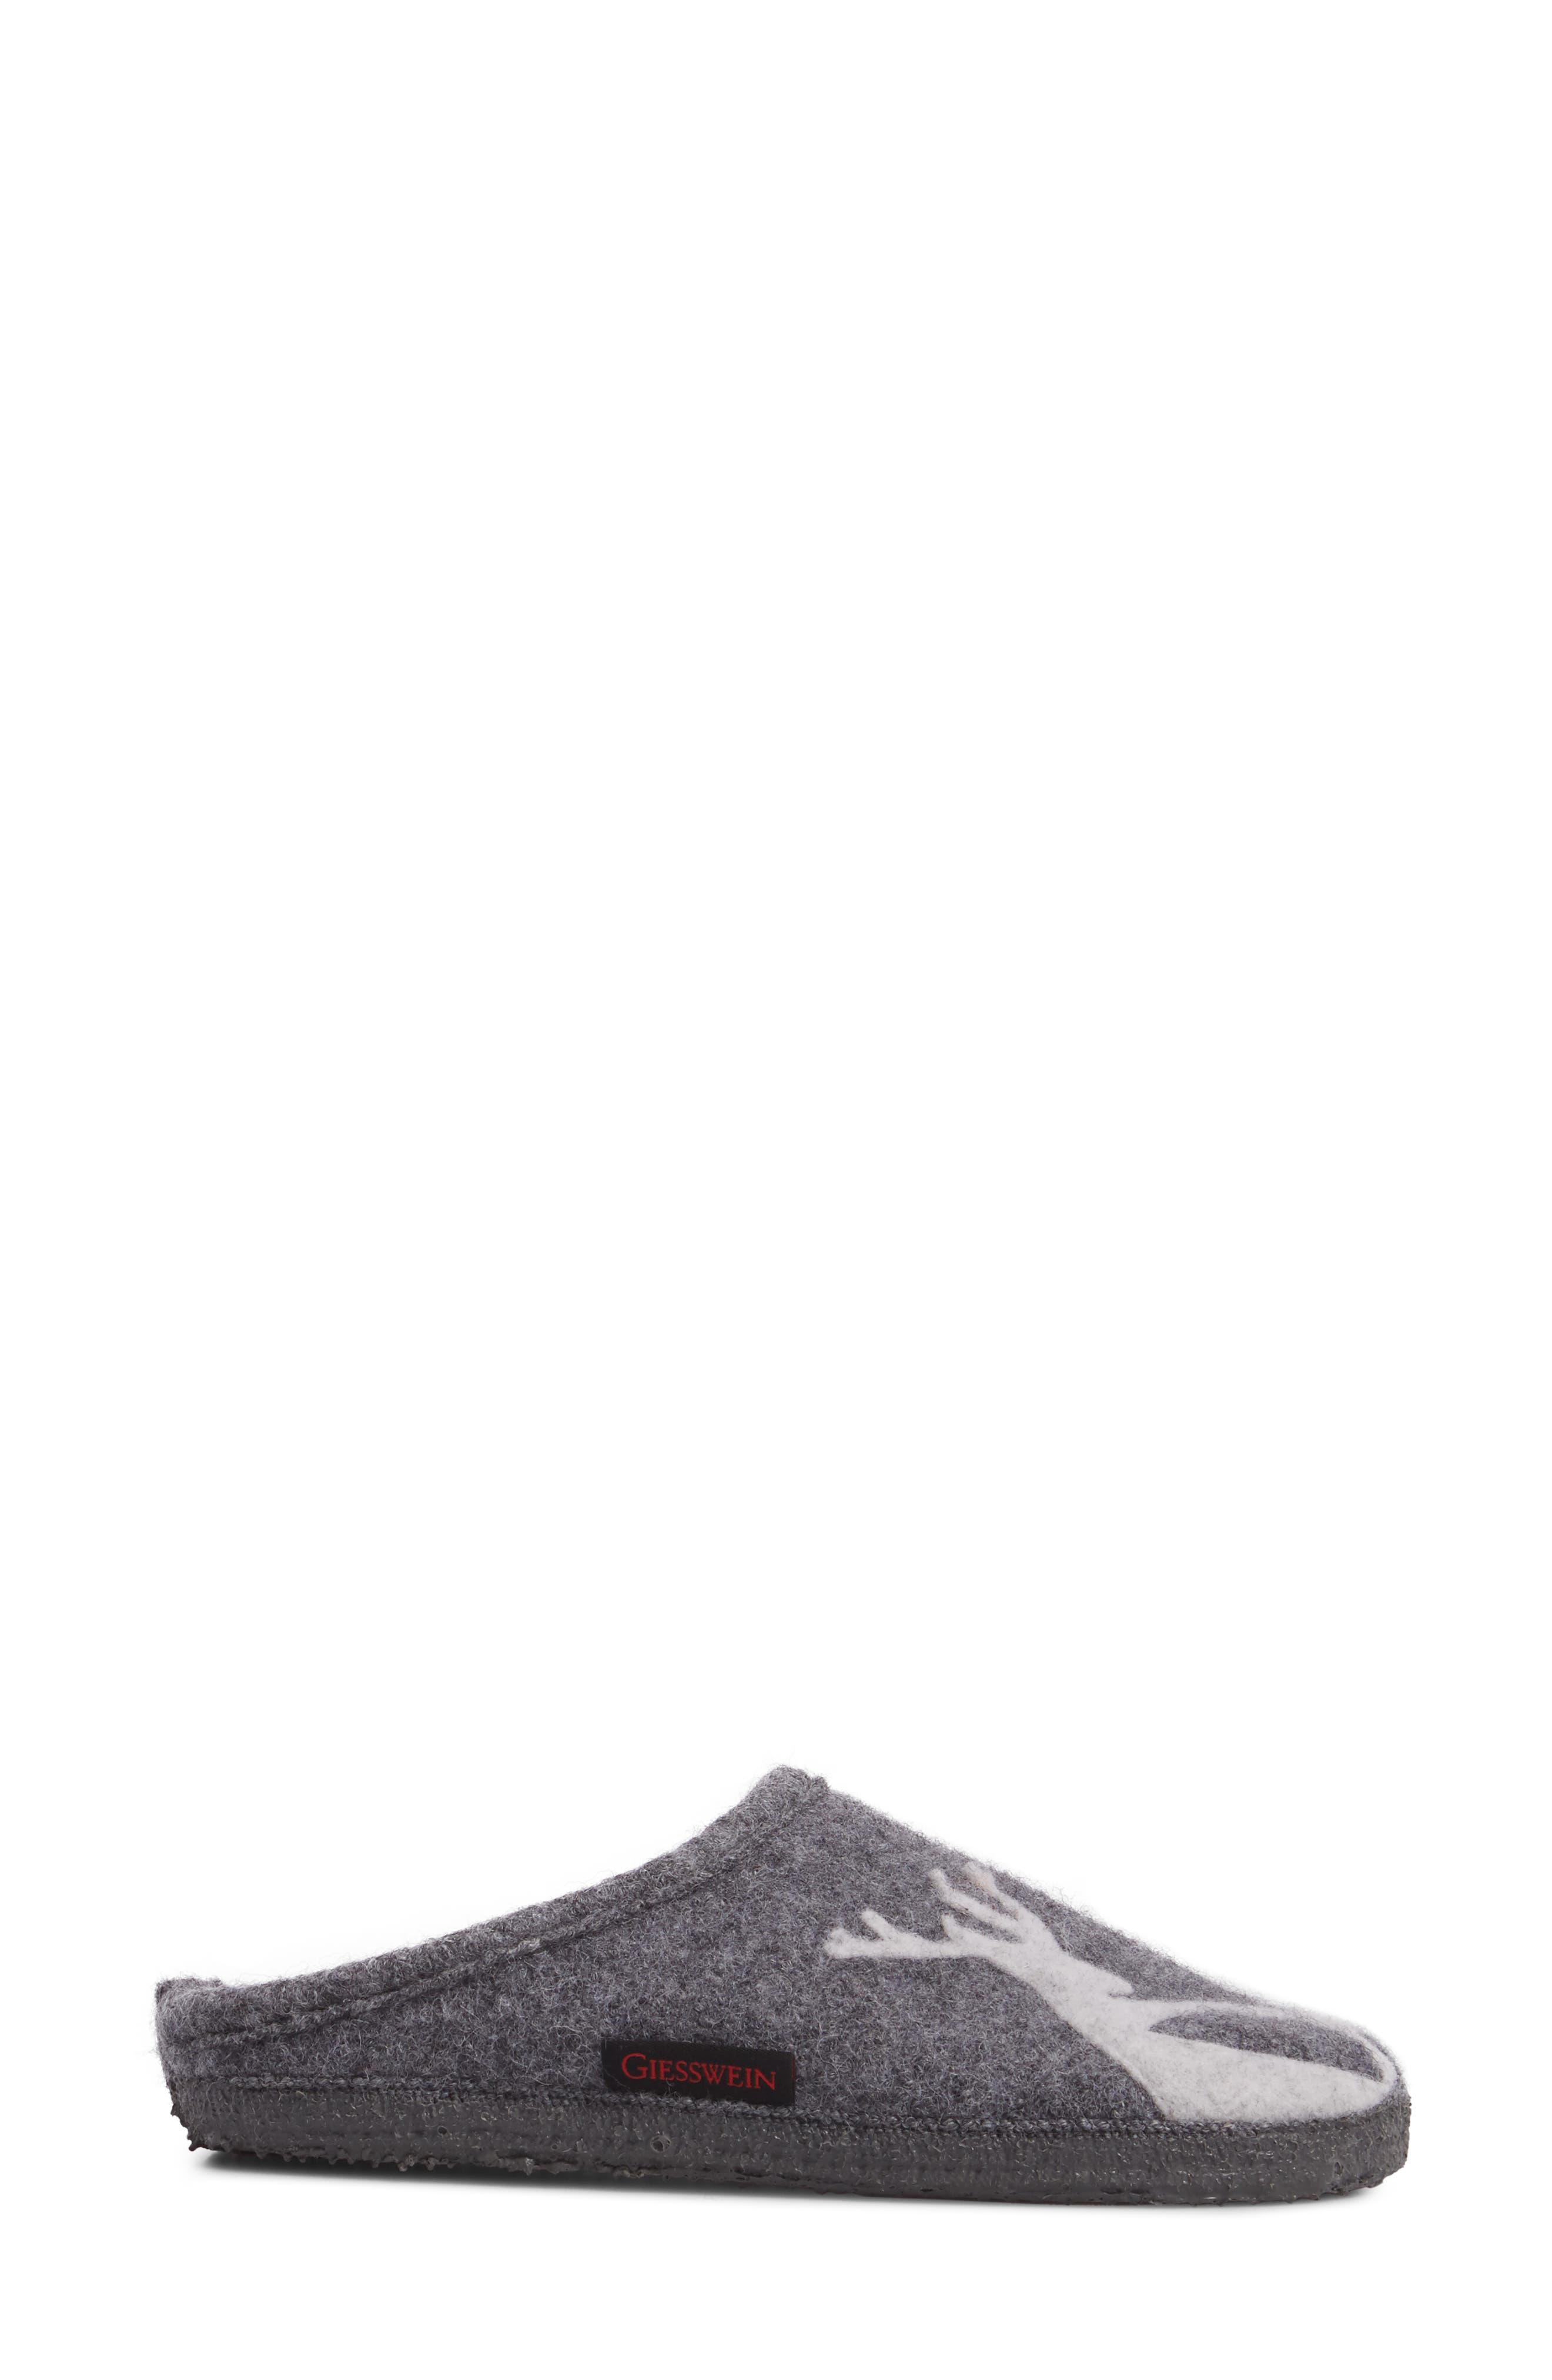 Yukon Slipper,                             Alternate thumbnail 3, color,                             030